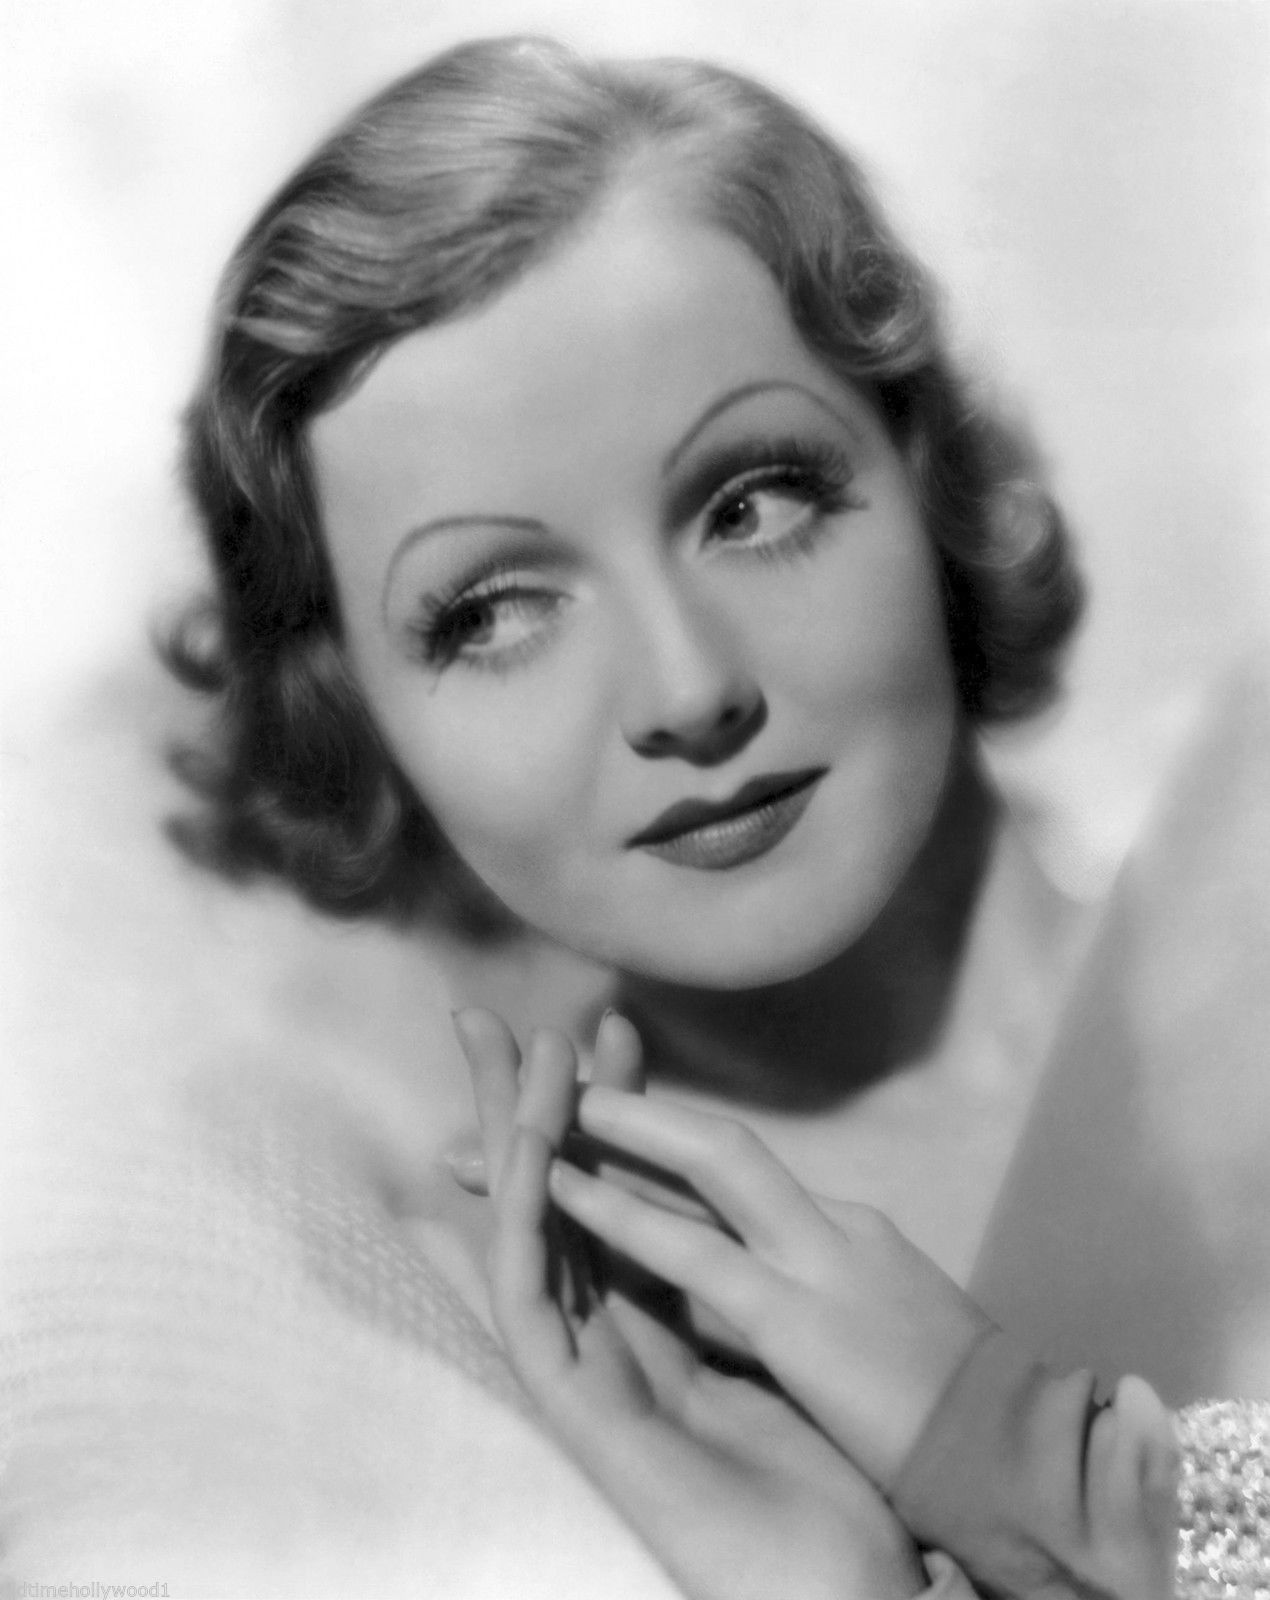 Heather Matarazzo,David Battley (1935?003) Hot pics & movies Thora Birch,Monique Gabriela Curnen